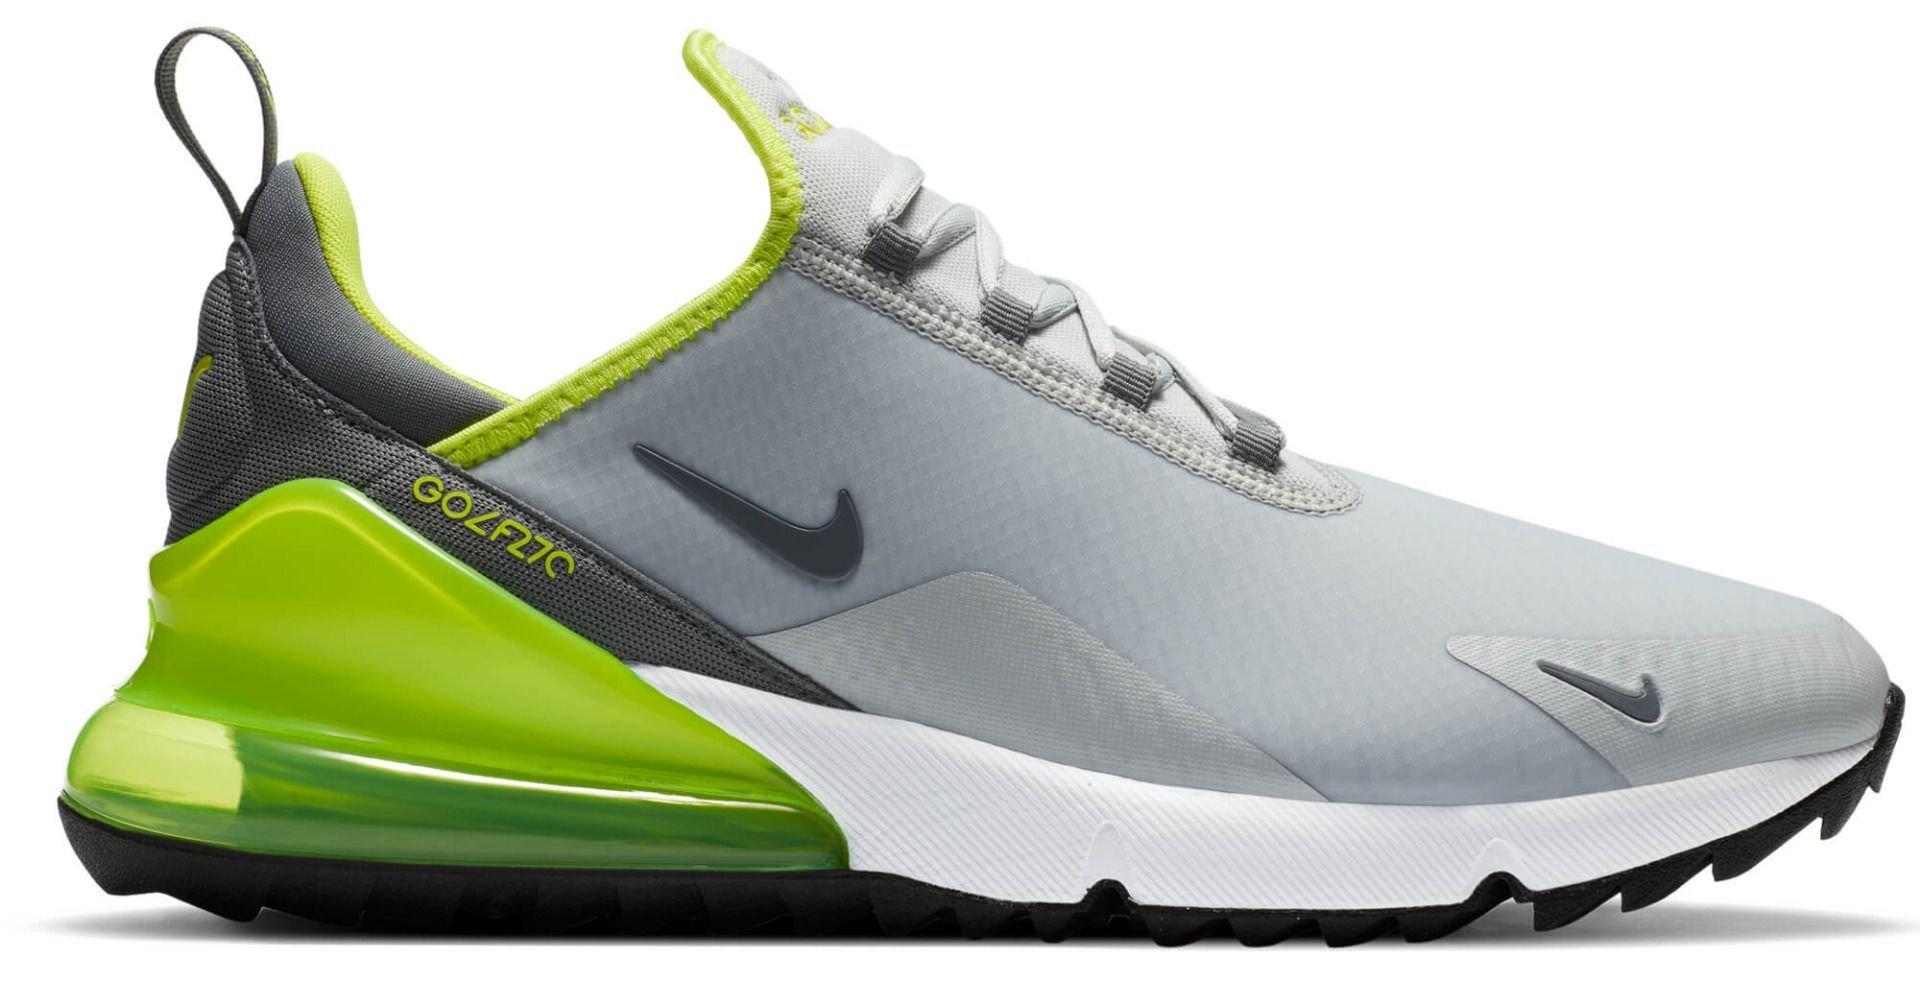 Nike Air Max 270 G Golf Shoes 2020 - Grey Fog/Smoke Grey/White/Black